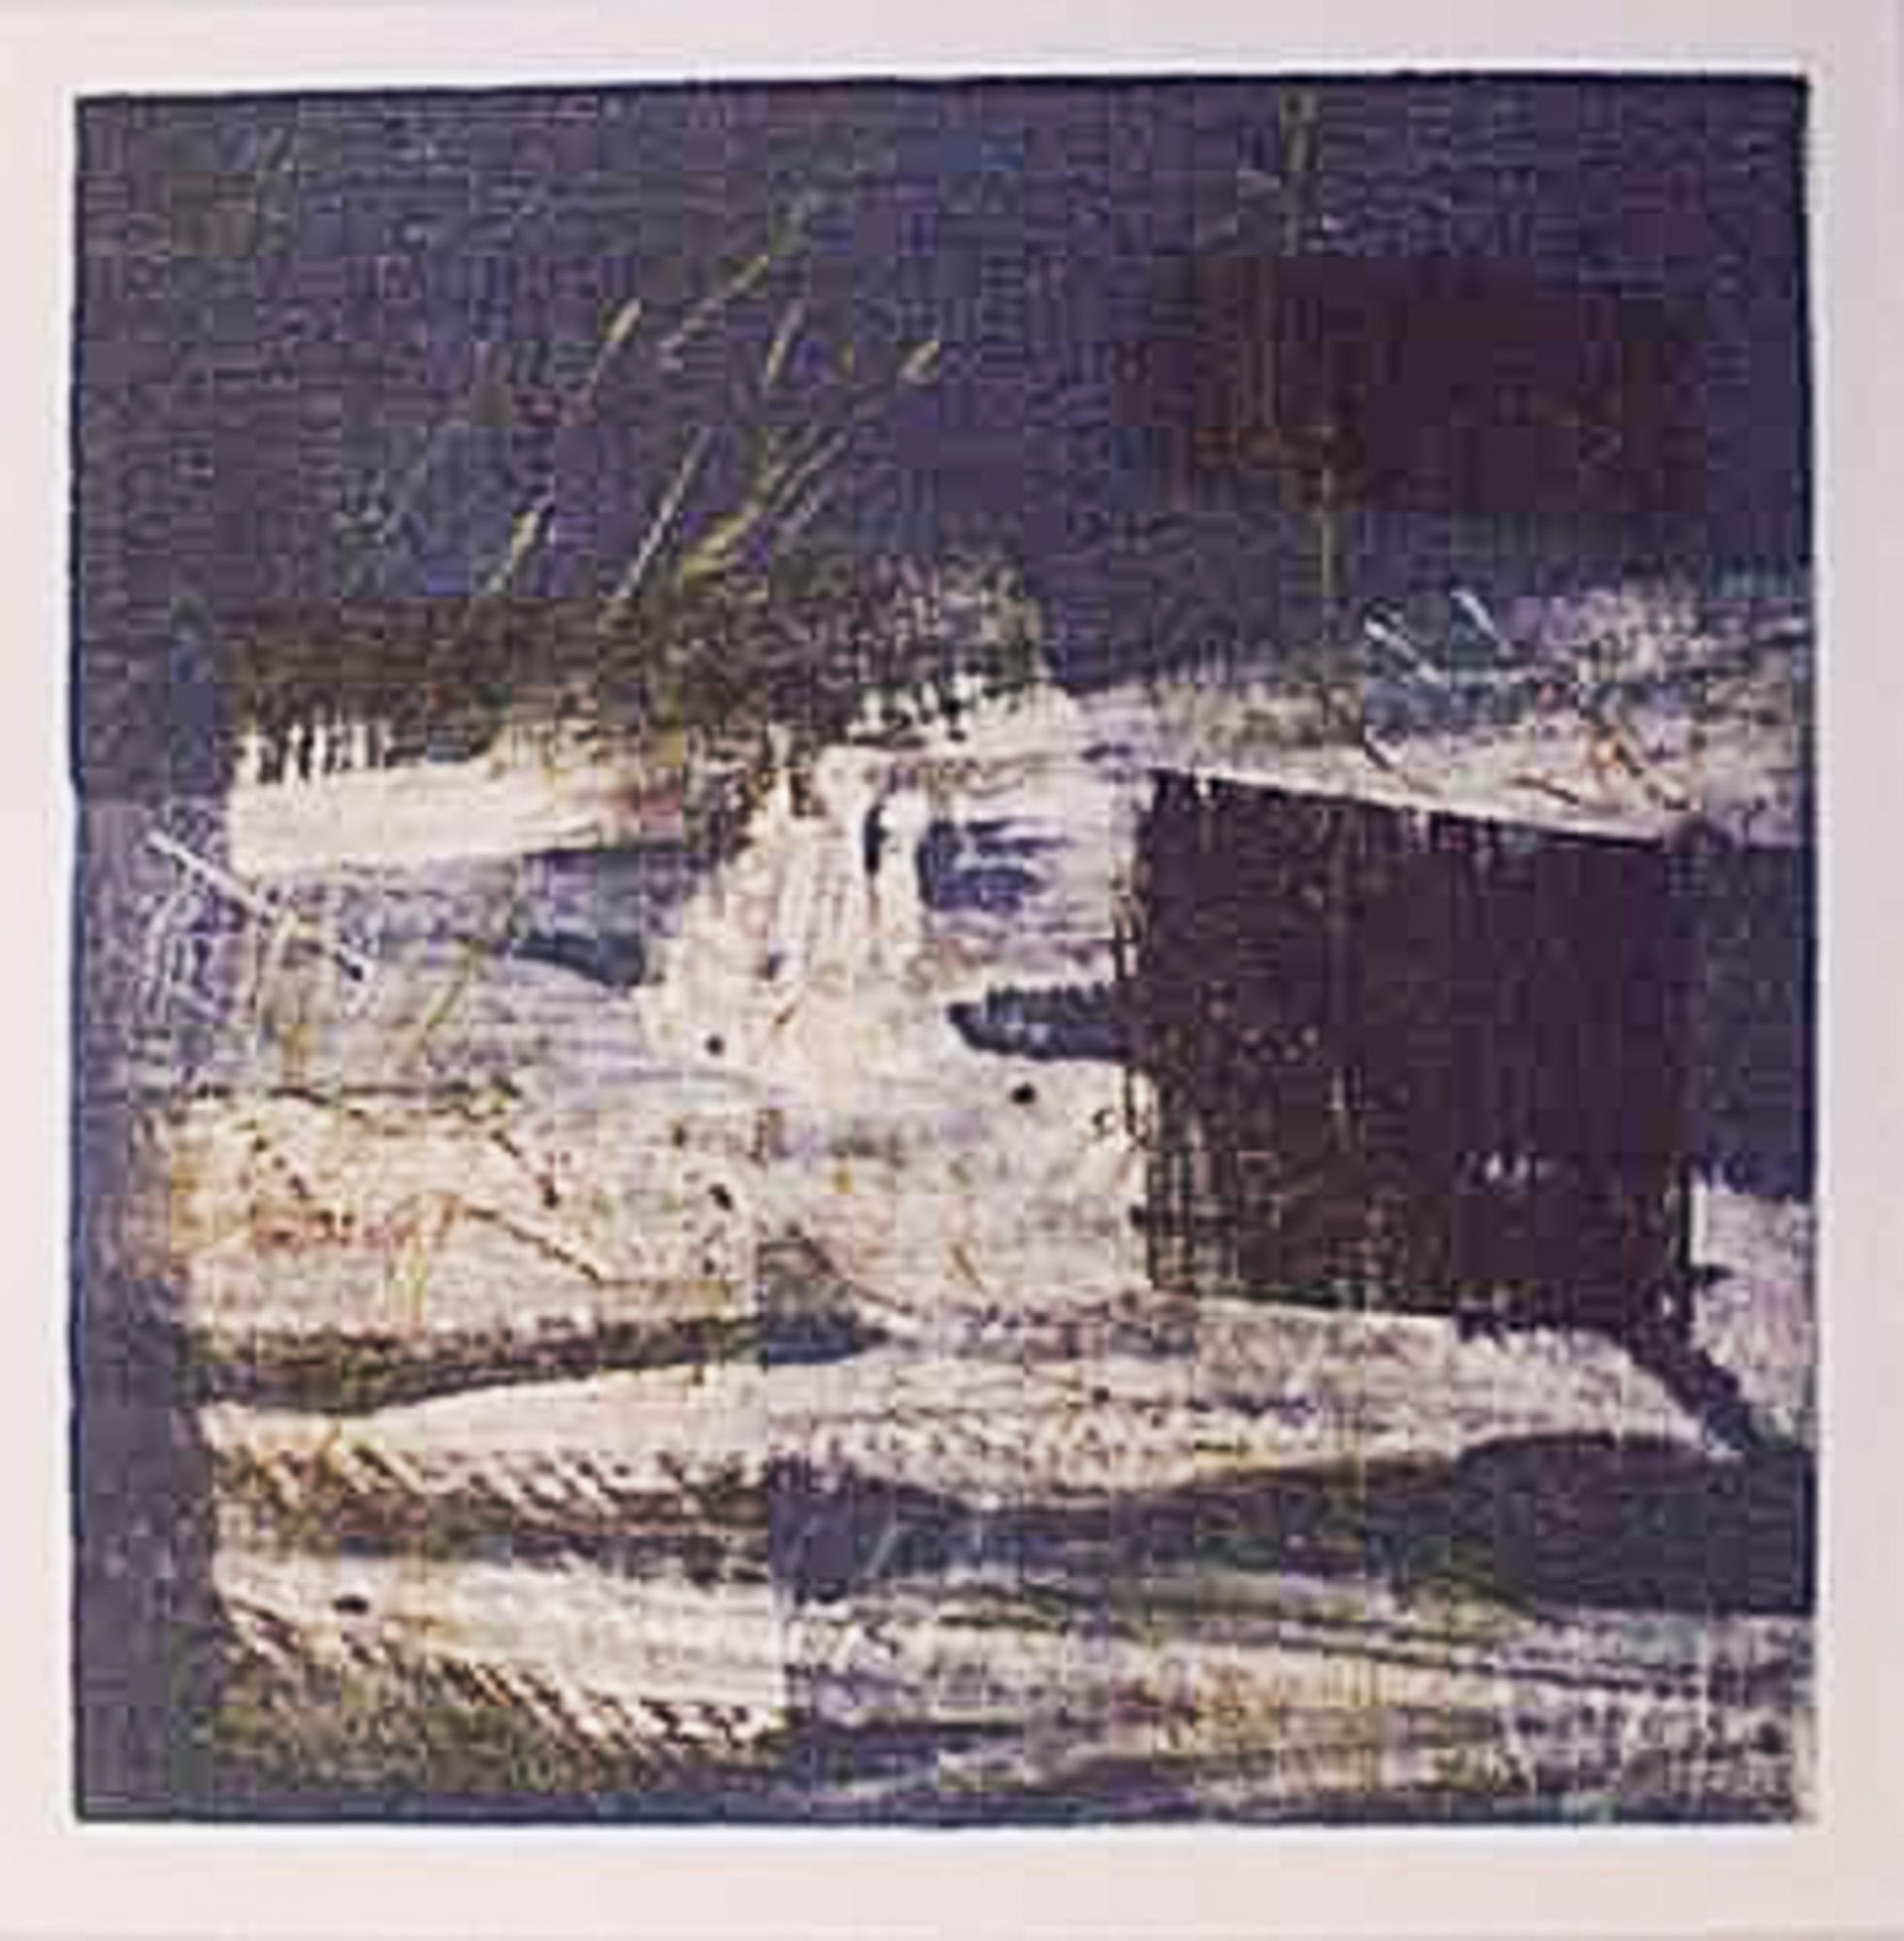 Nocturne II, 1999, Gravure monotype 50x50cm